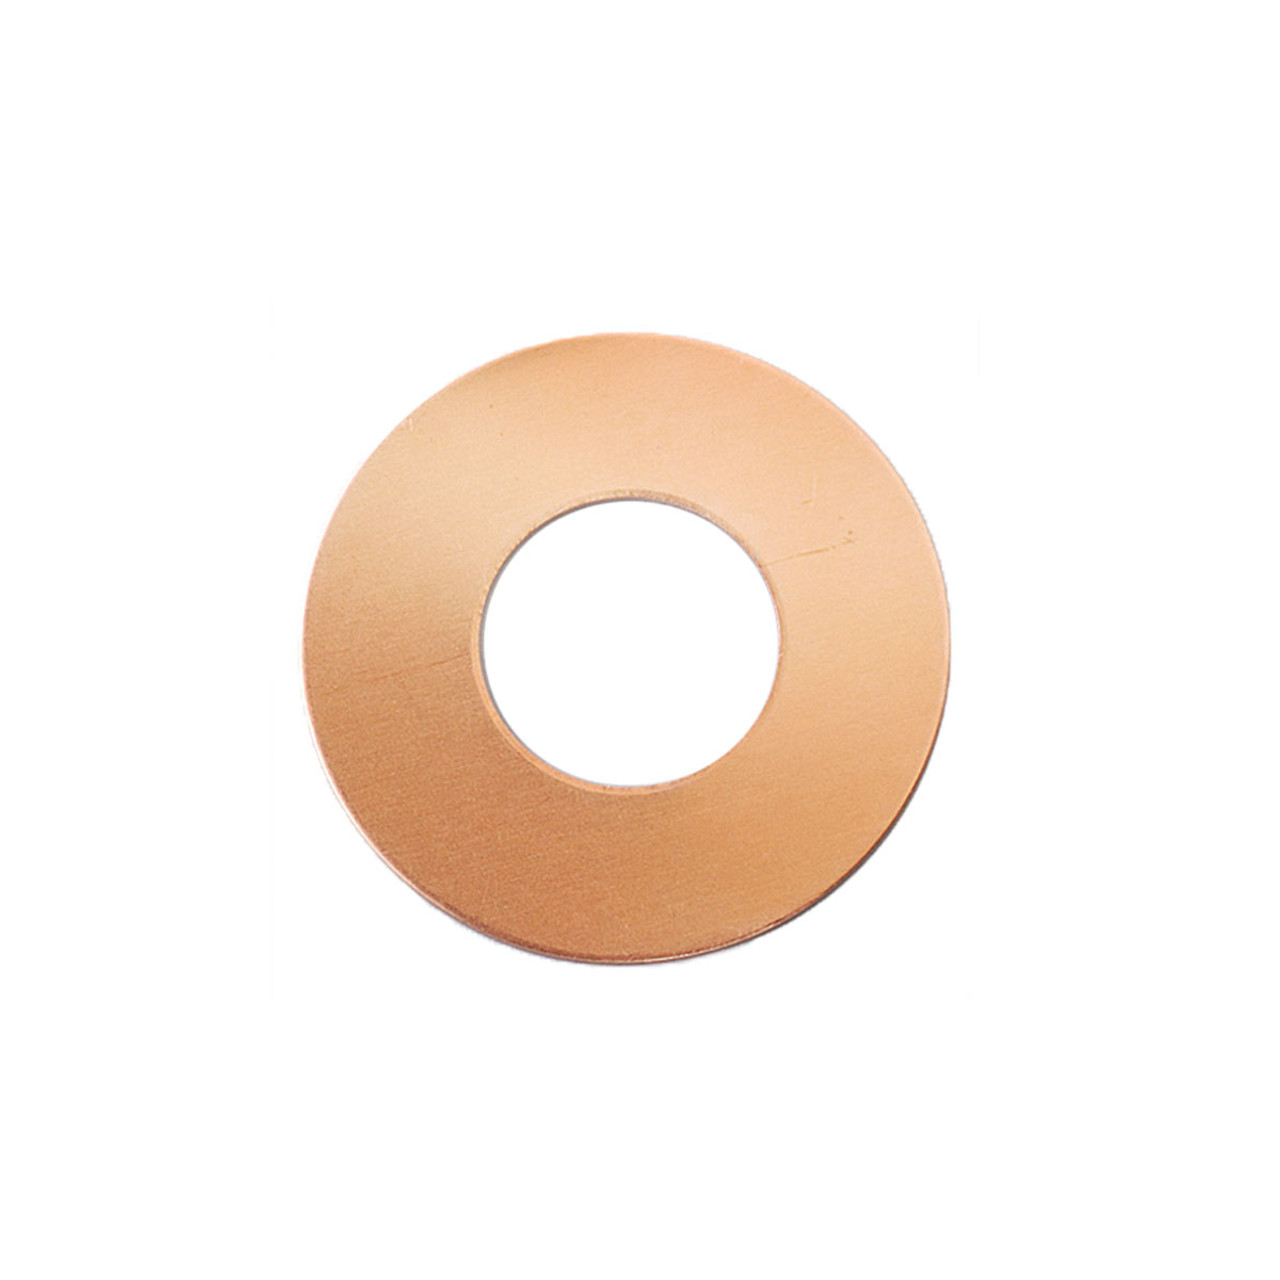 Copper Blank - Donut - 35mm